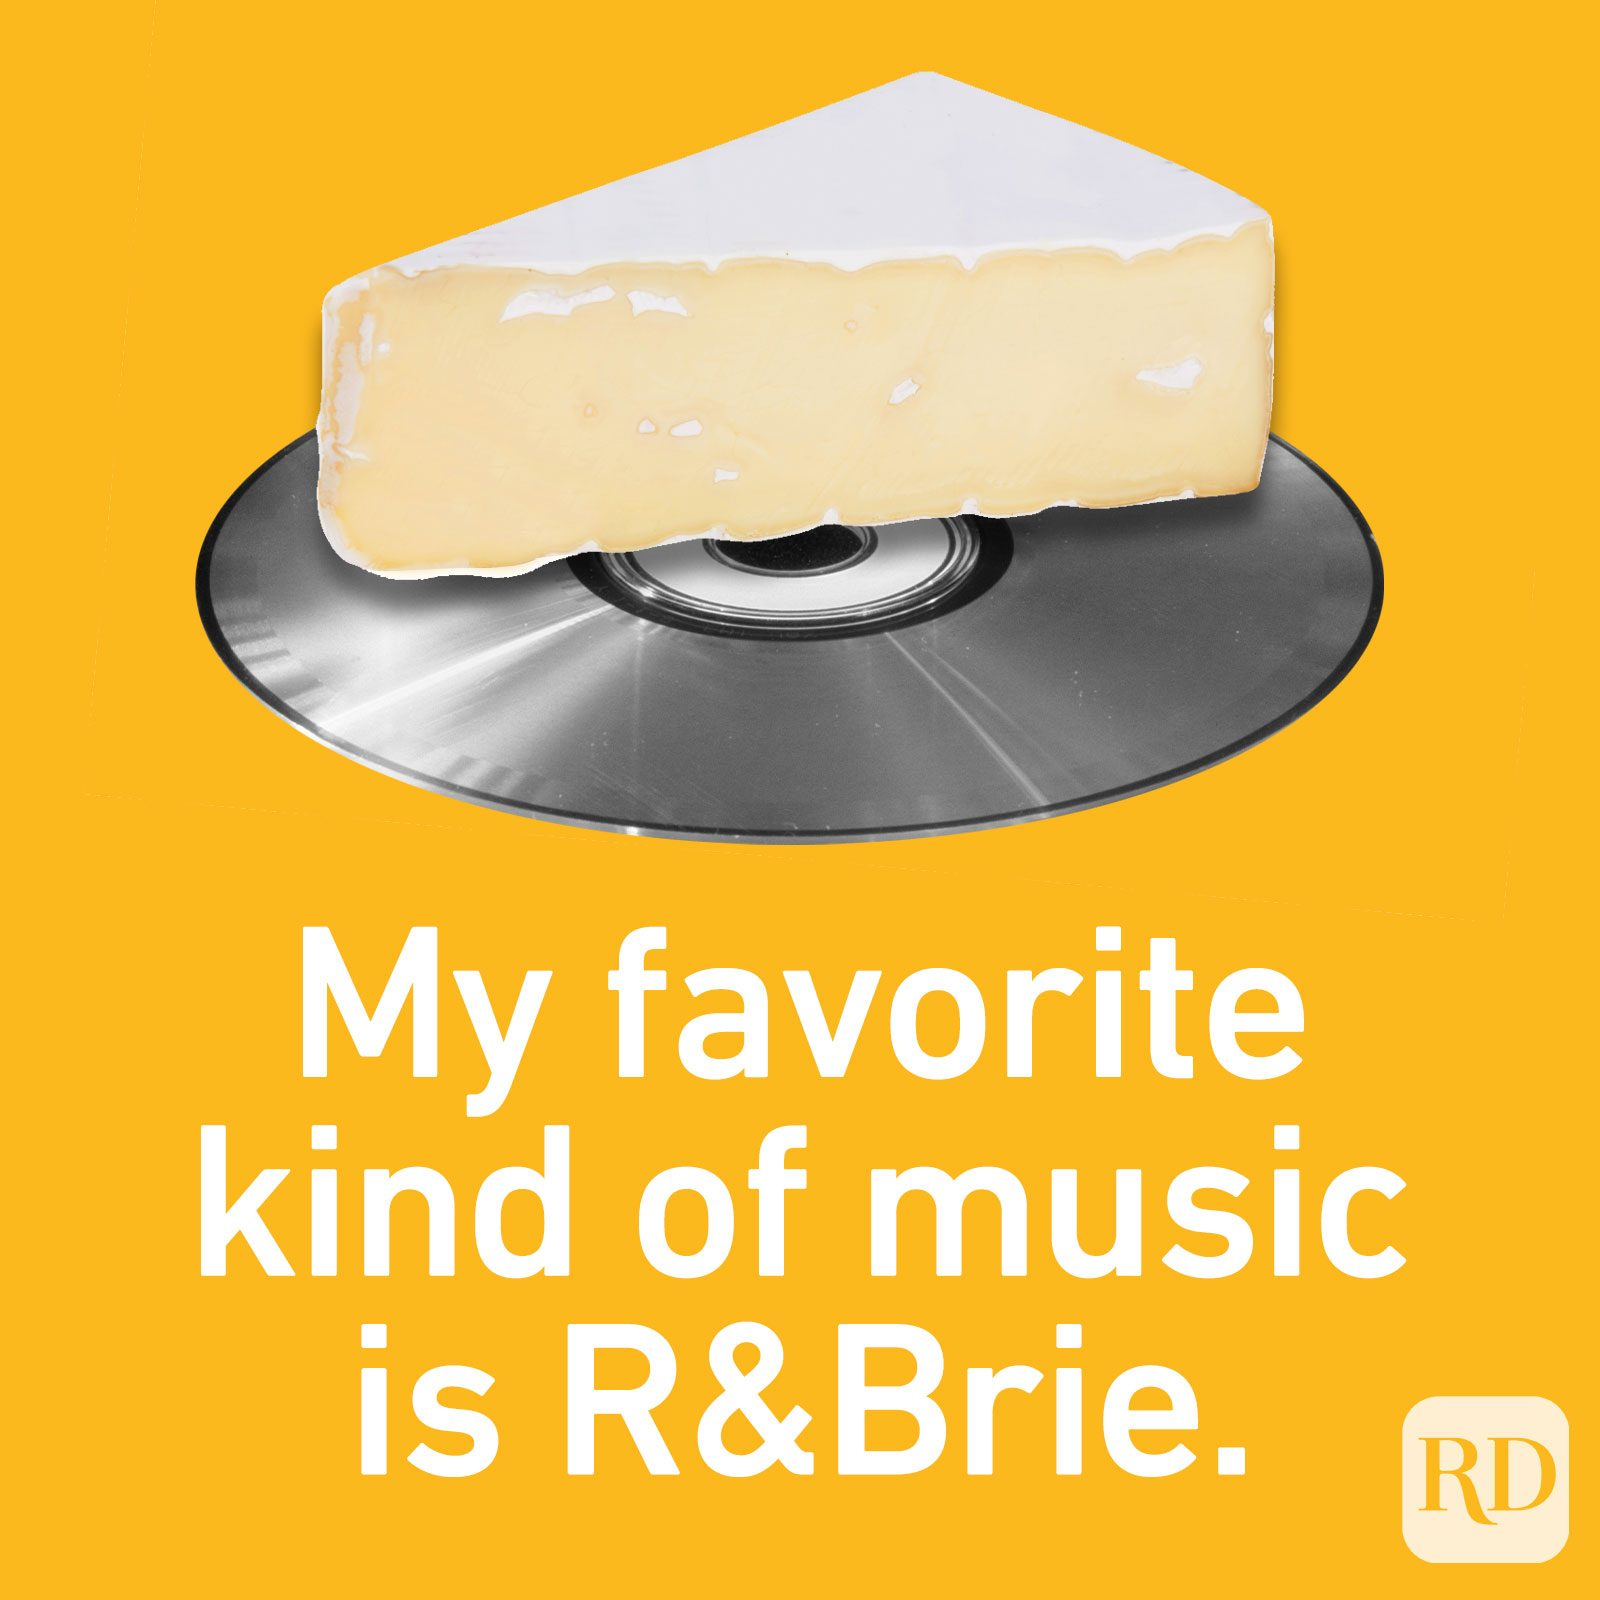 My favorite kind of music is R&Brie.